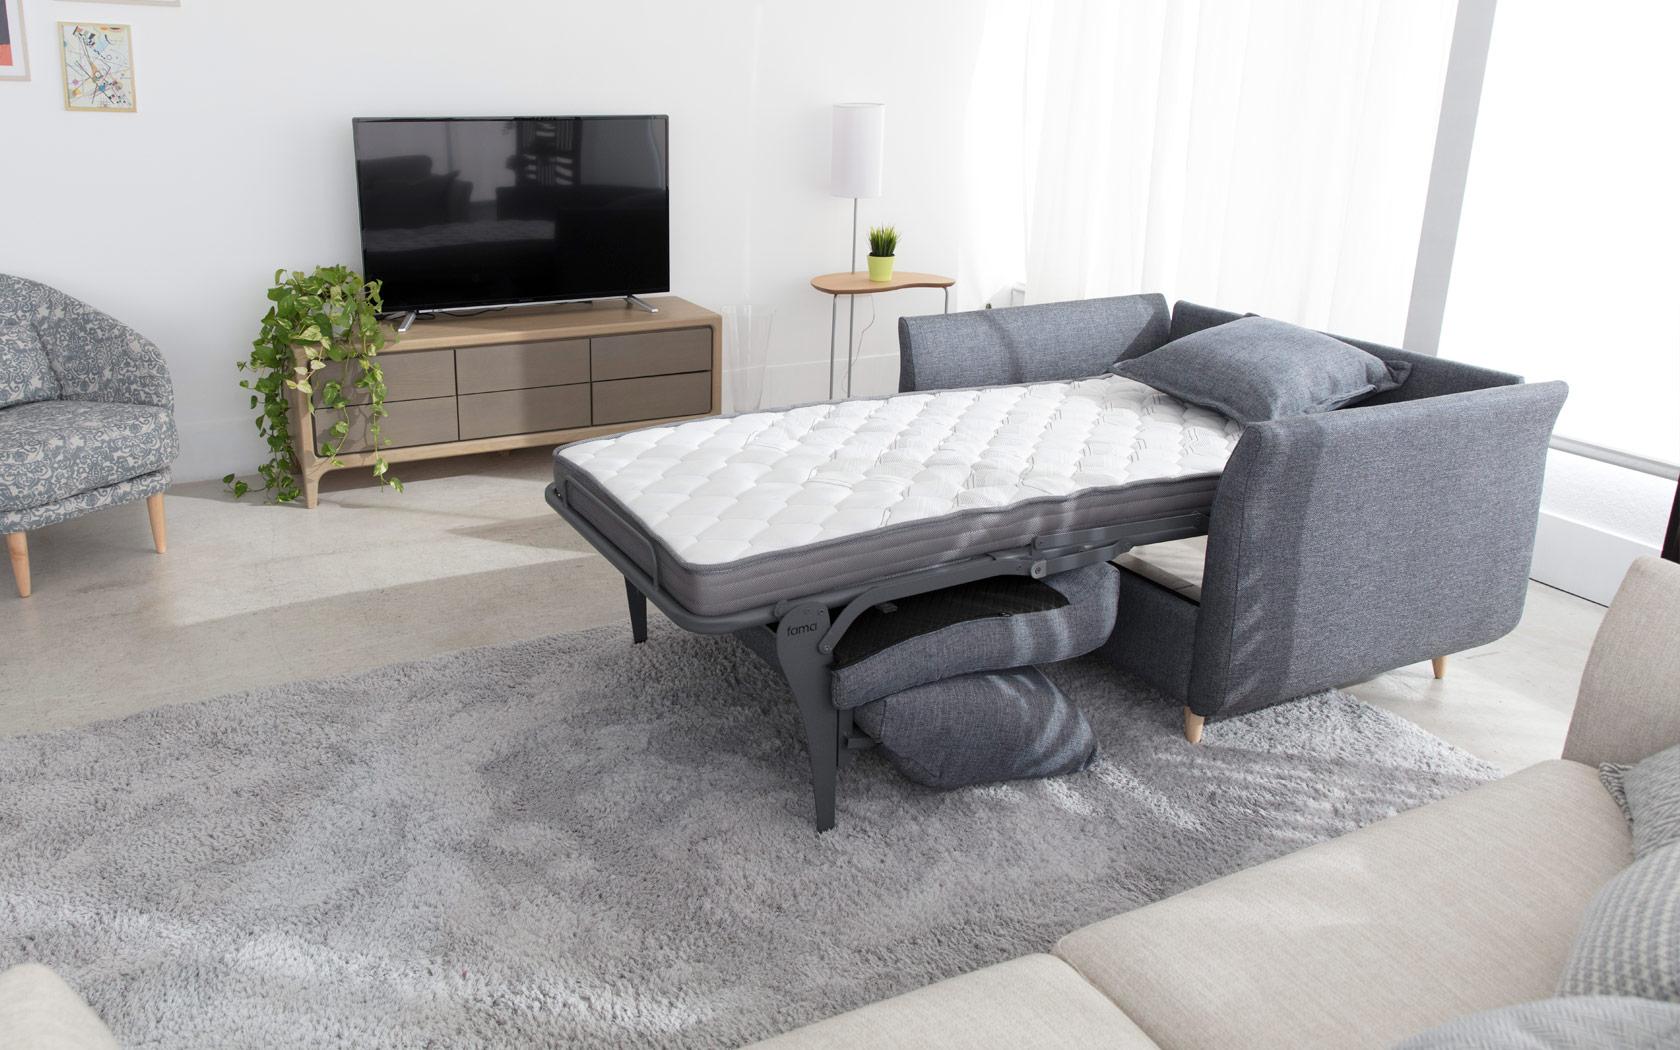 Helsinki sillón cama 2020 02